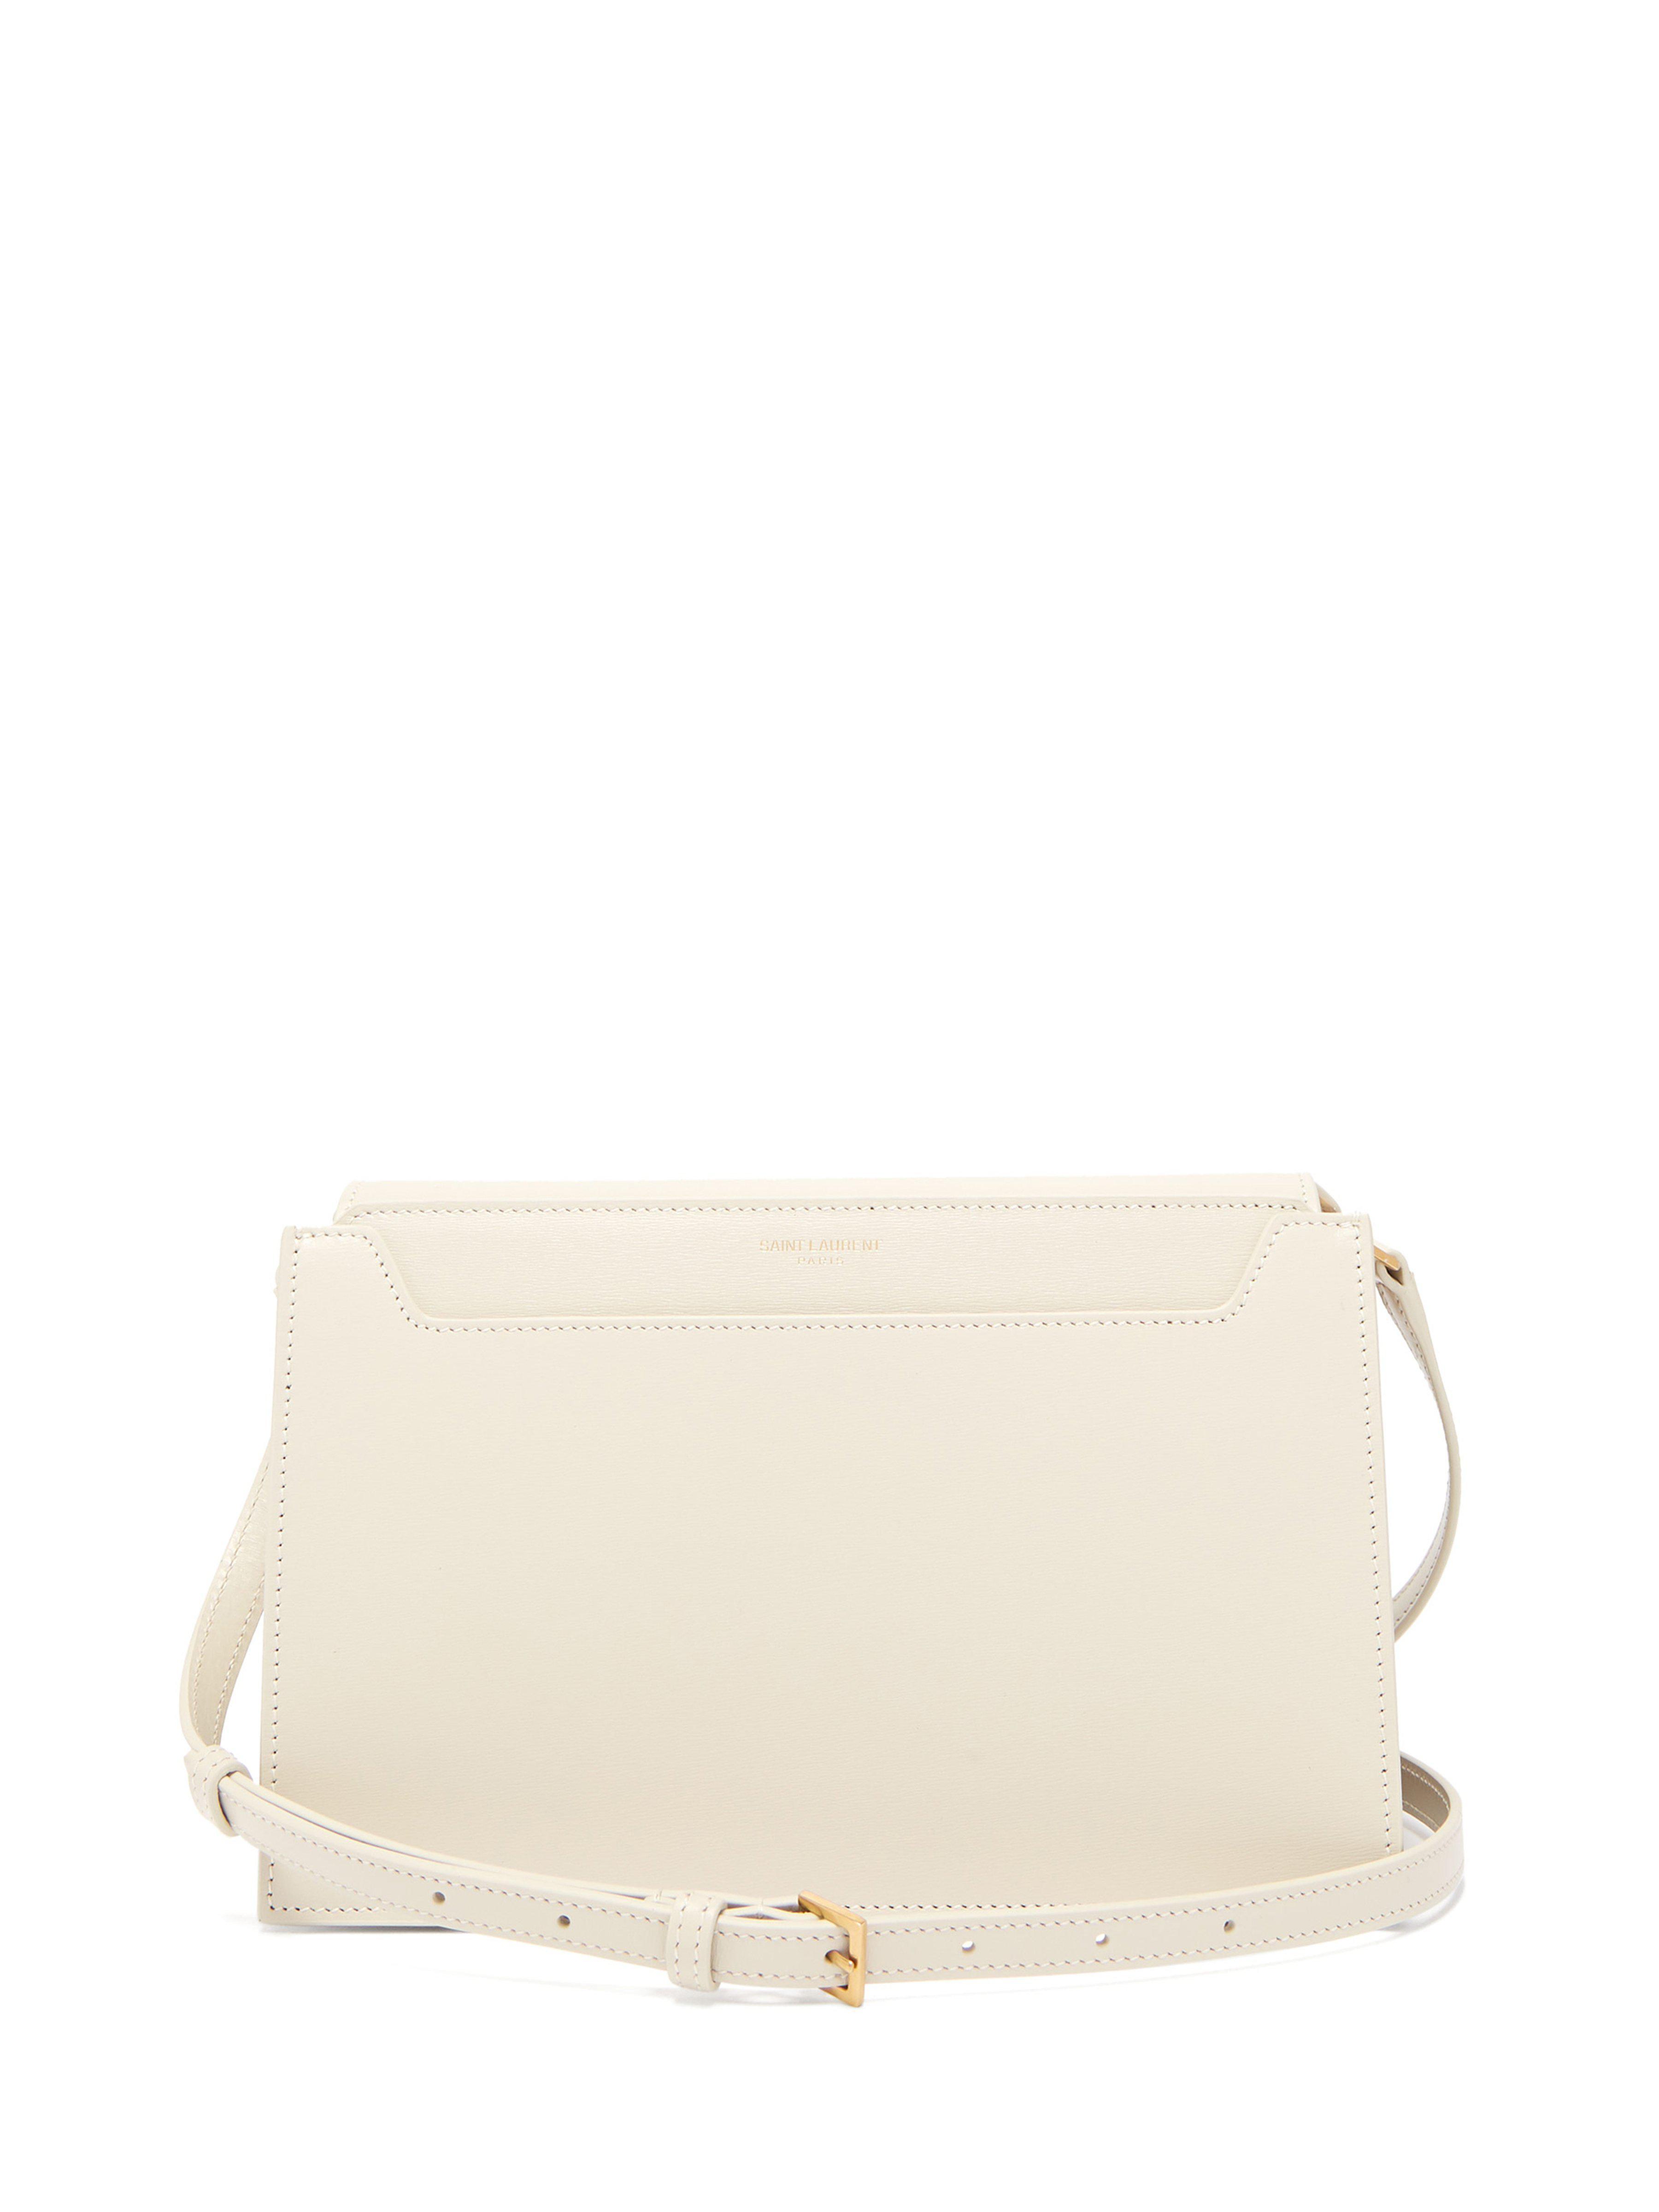 Saint Laurent Catherine Leather Cross Body Bag in White - Lyst 108b5eeab51d8